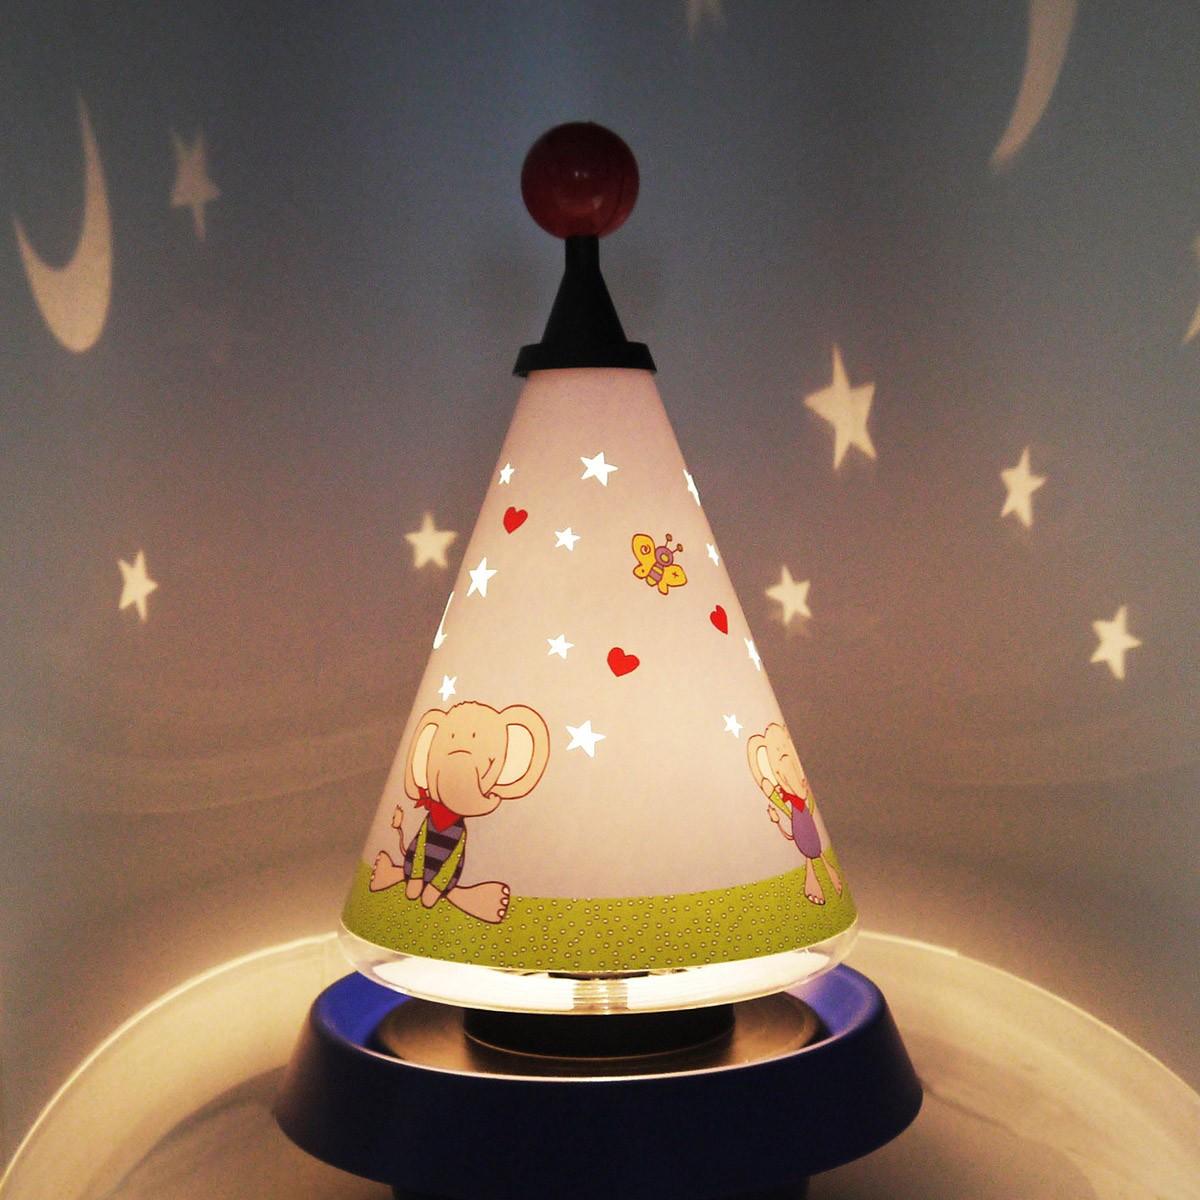 Niermann Standby Lolo Lombardo Carrousel Tischleuchte, mit Sternen Projektion